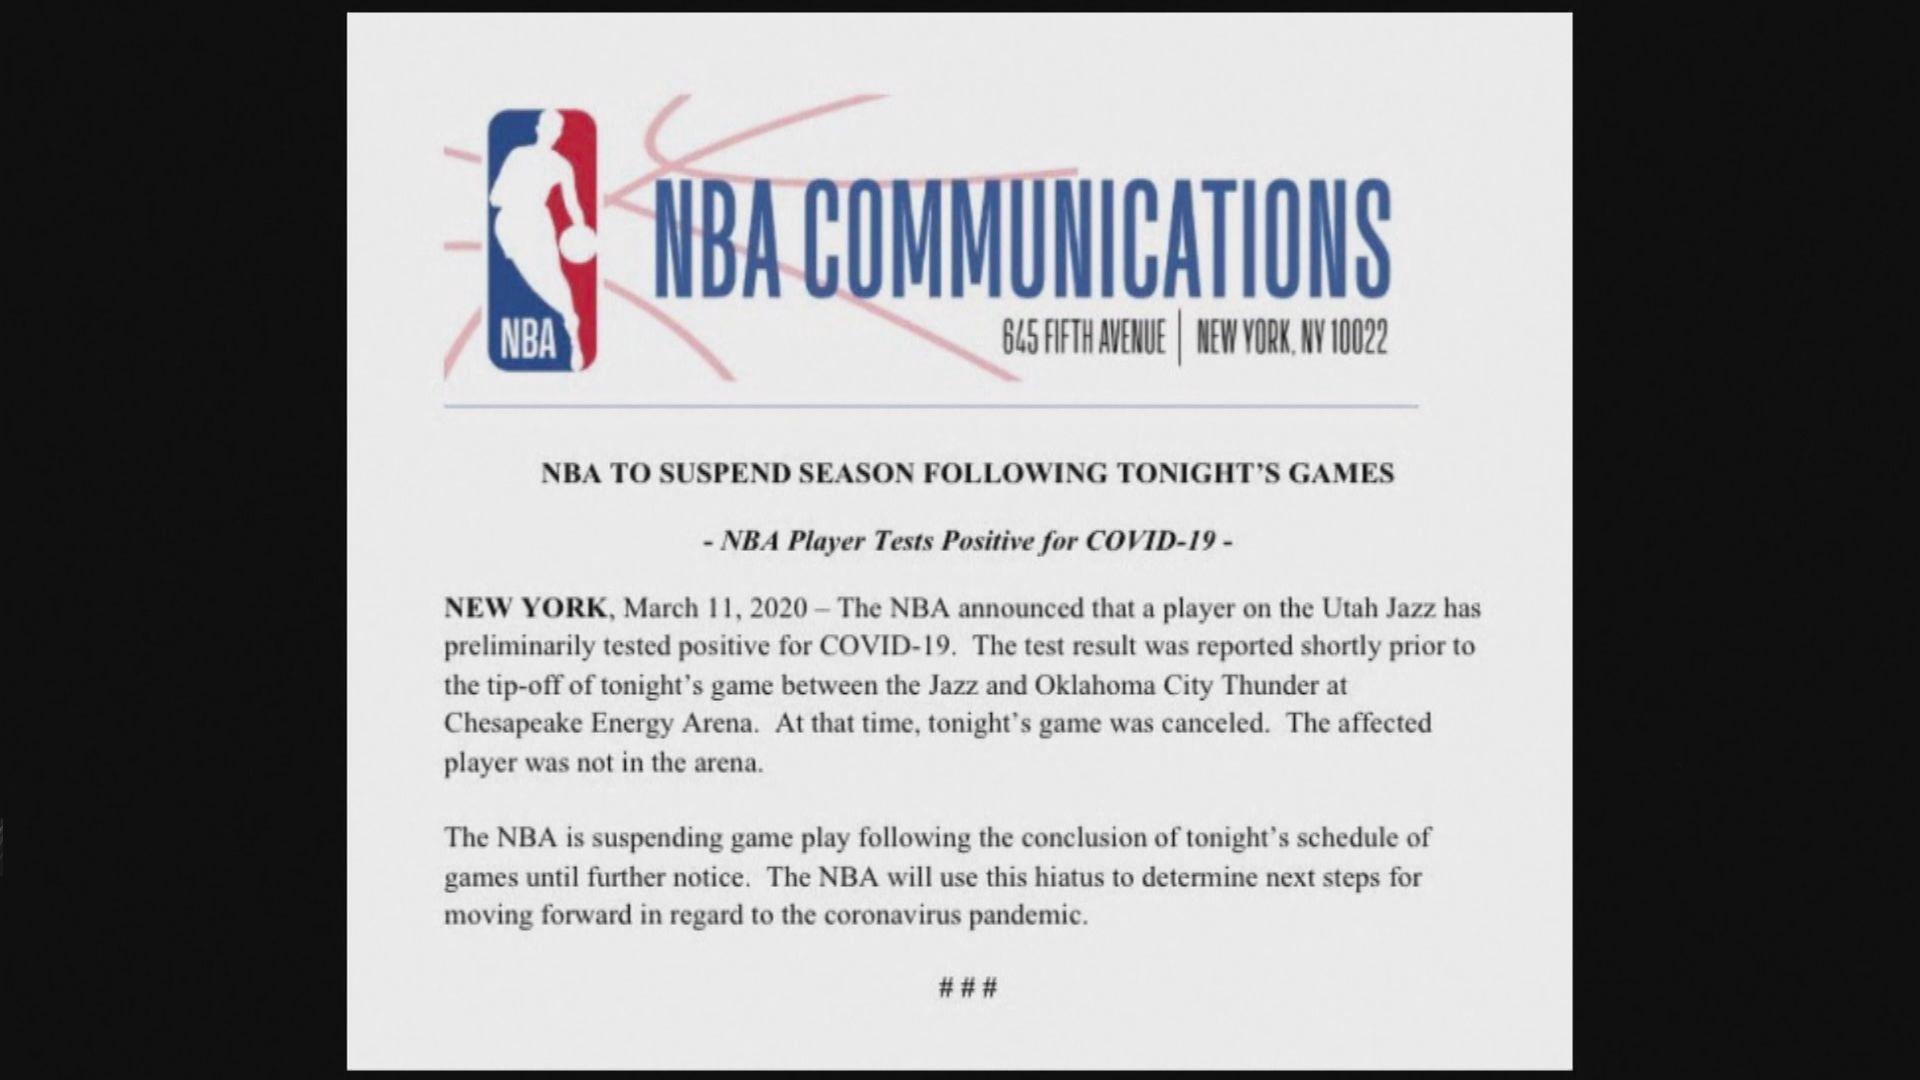 NBA有球員初步確診 今季所有賽事暫停